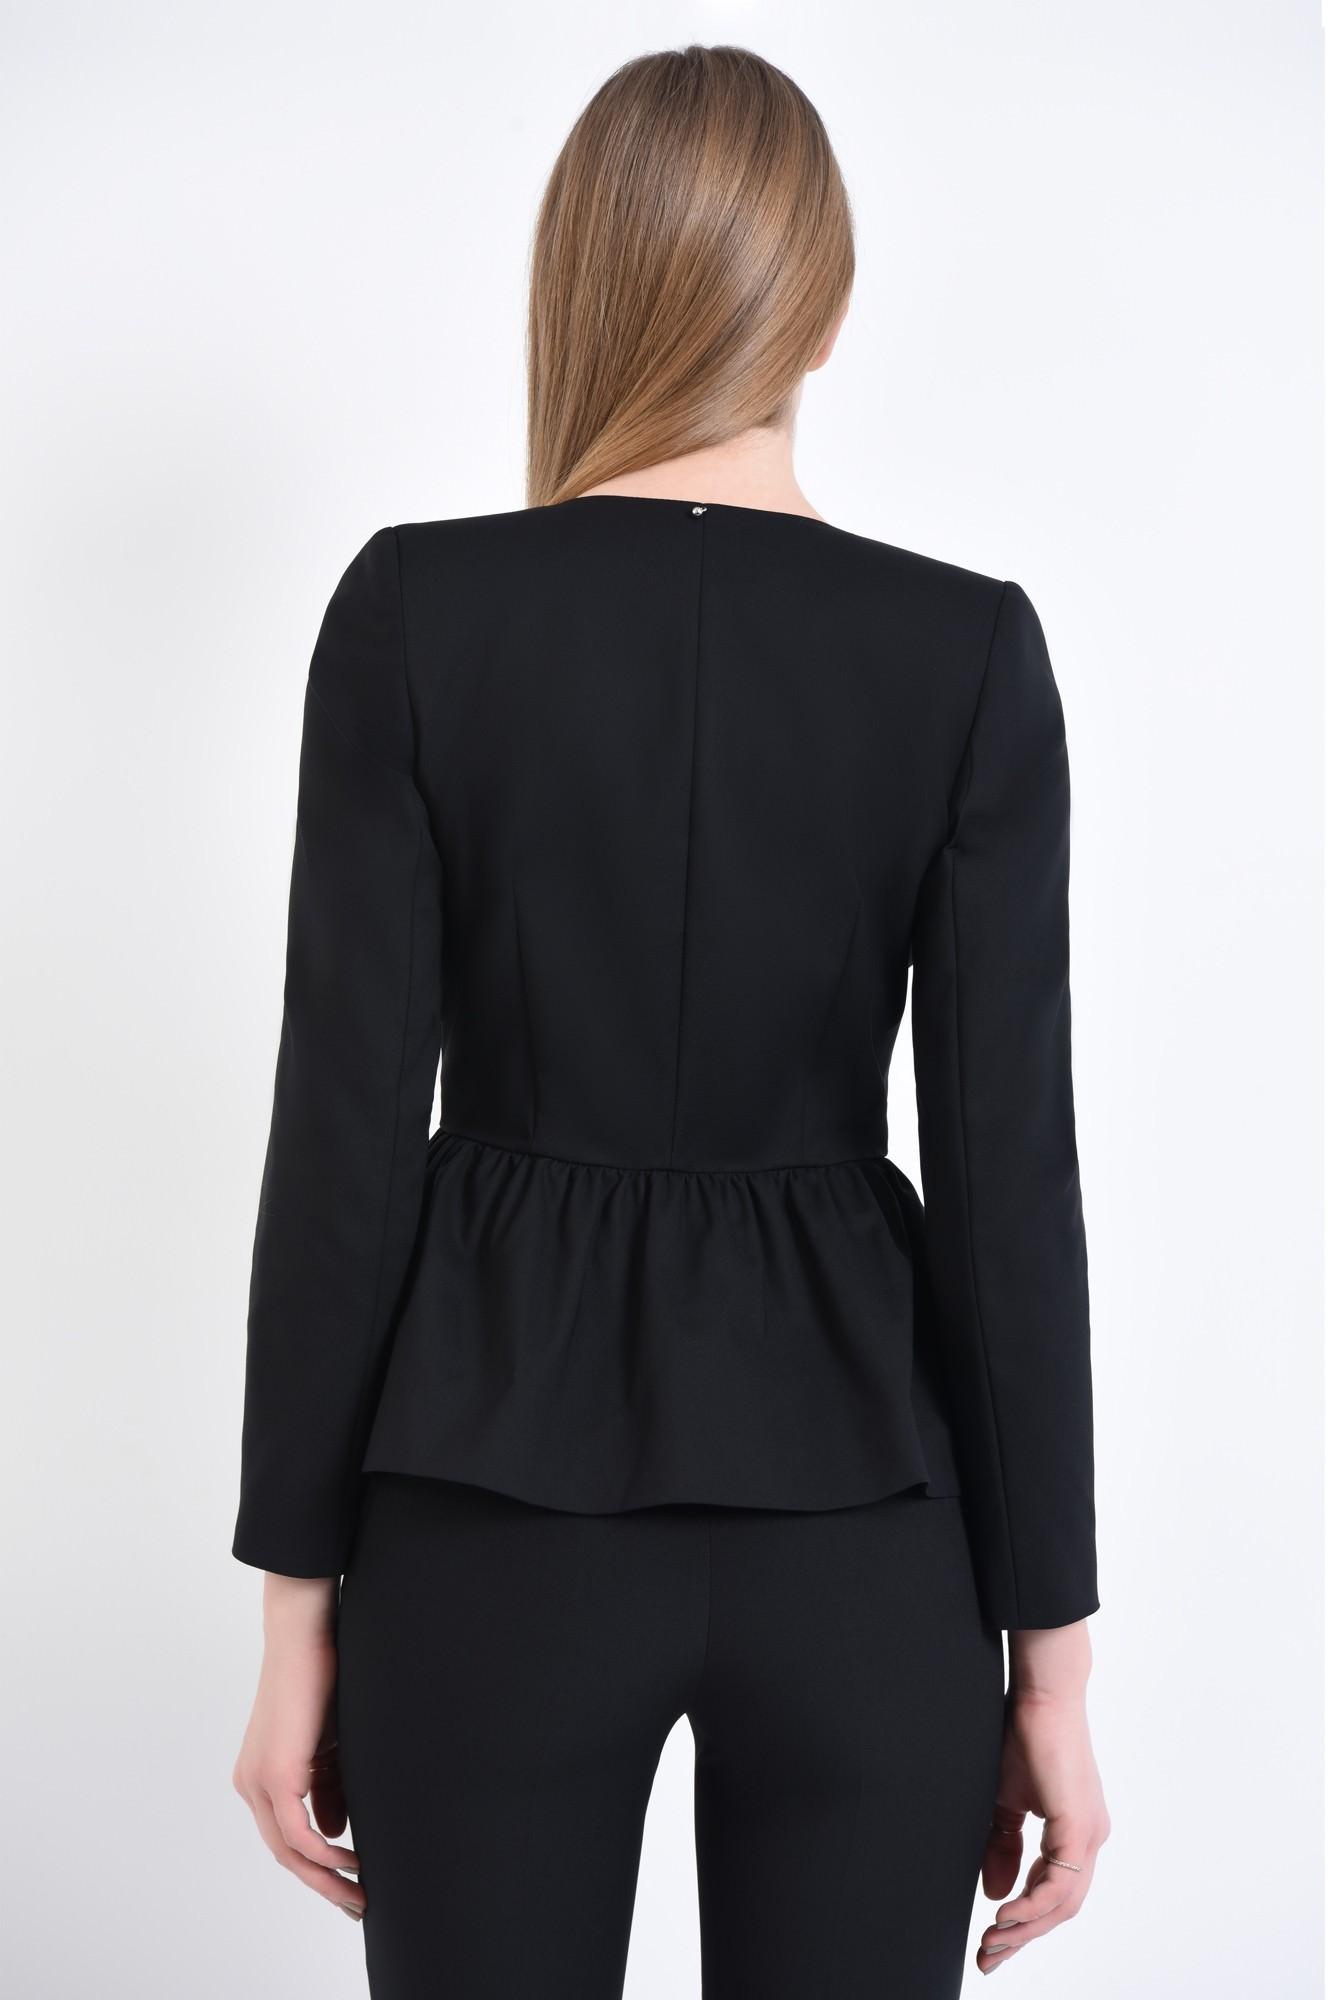 1 - Sacou casual, negru